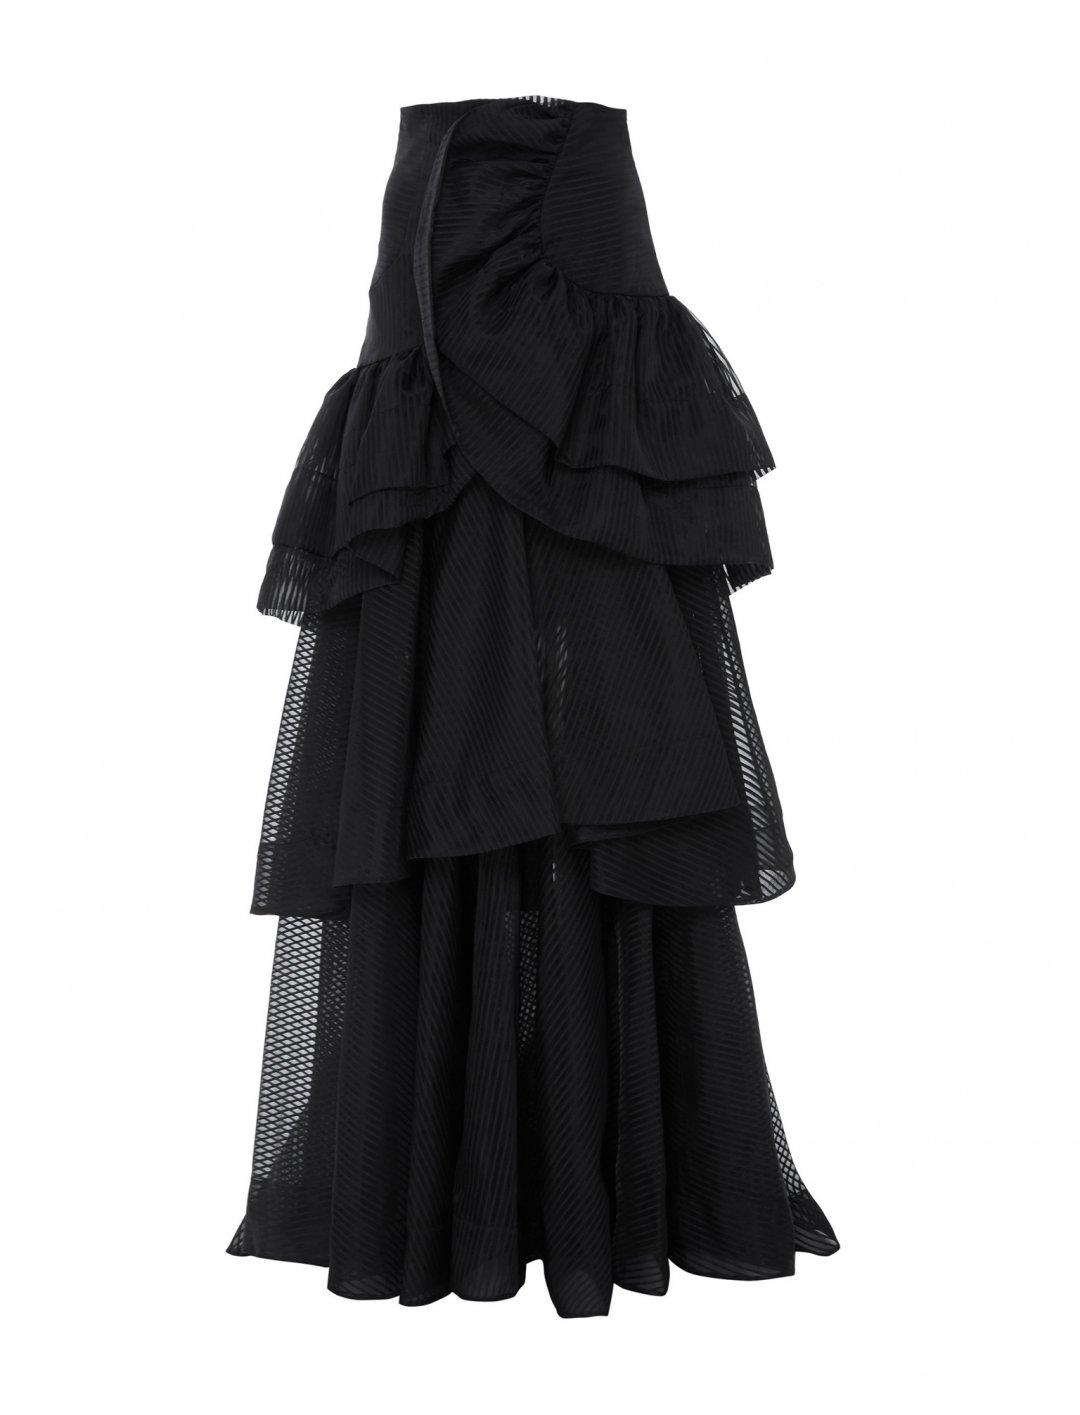 Zara Larsson's Skirt Clothing Alice McCall